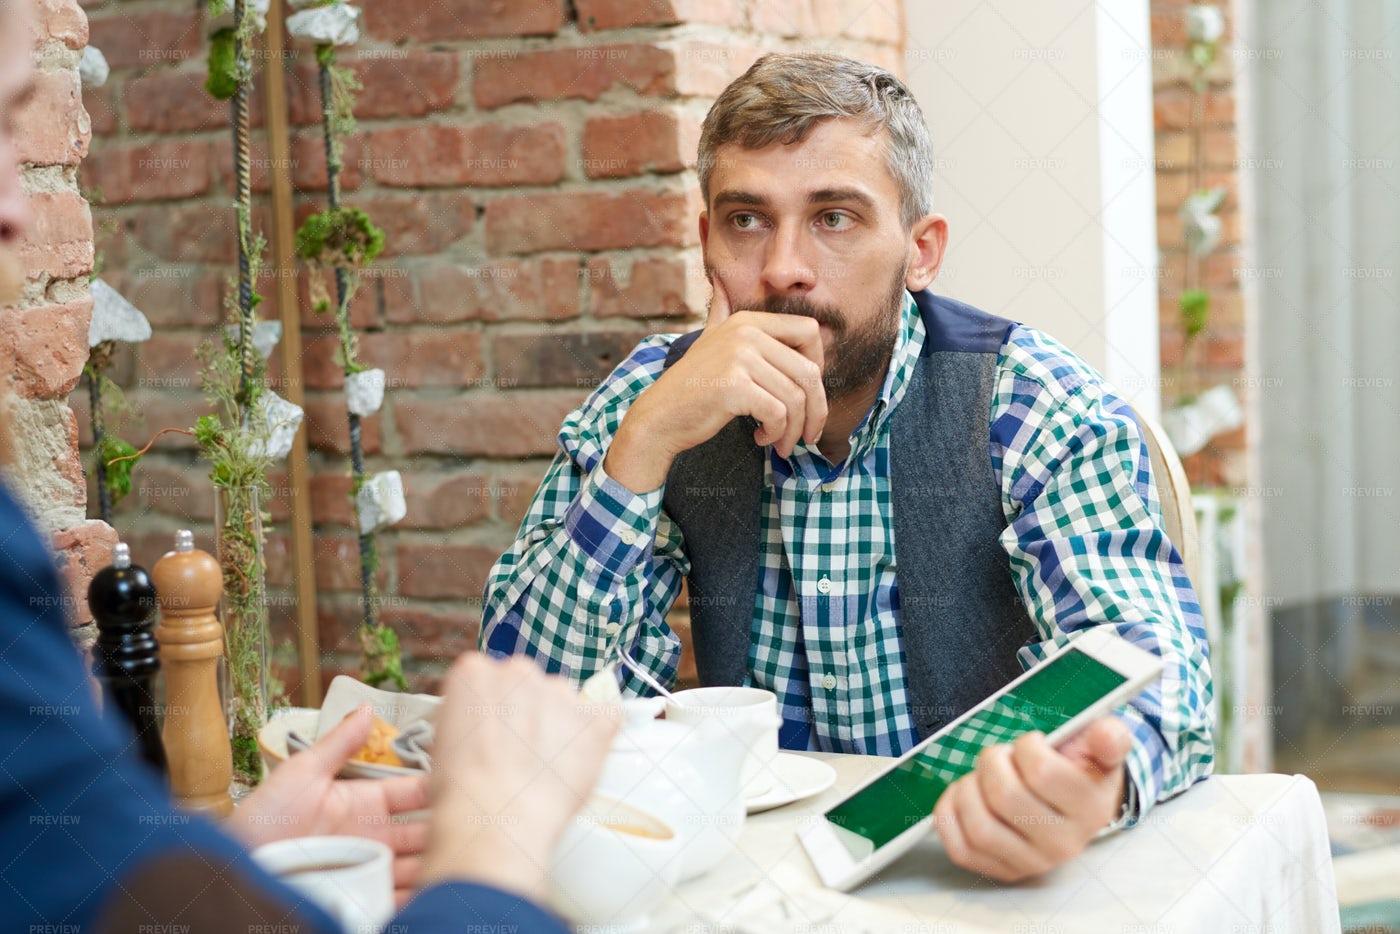 Working Meeting In Informal...: Stock Photos